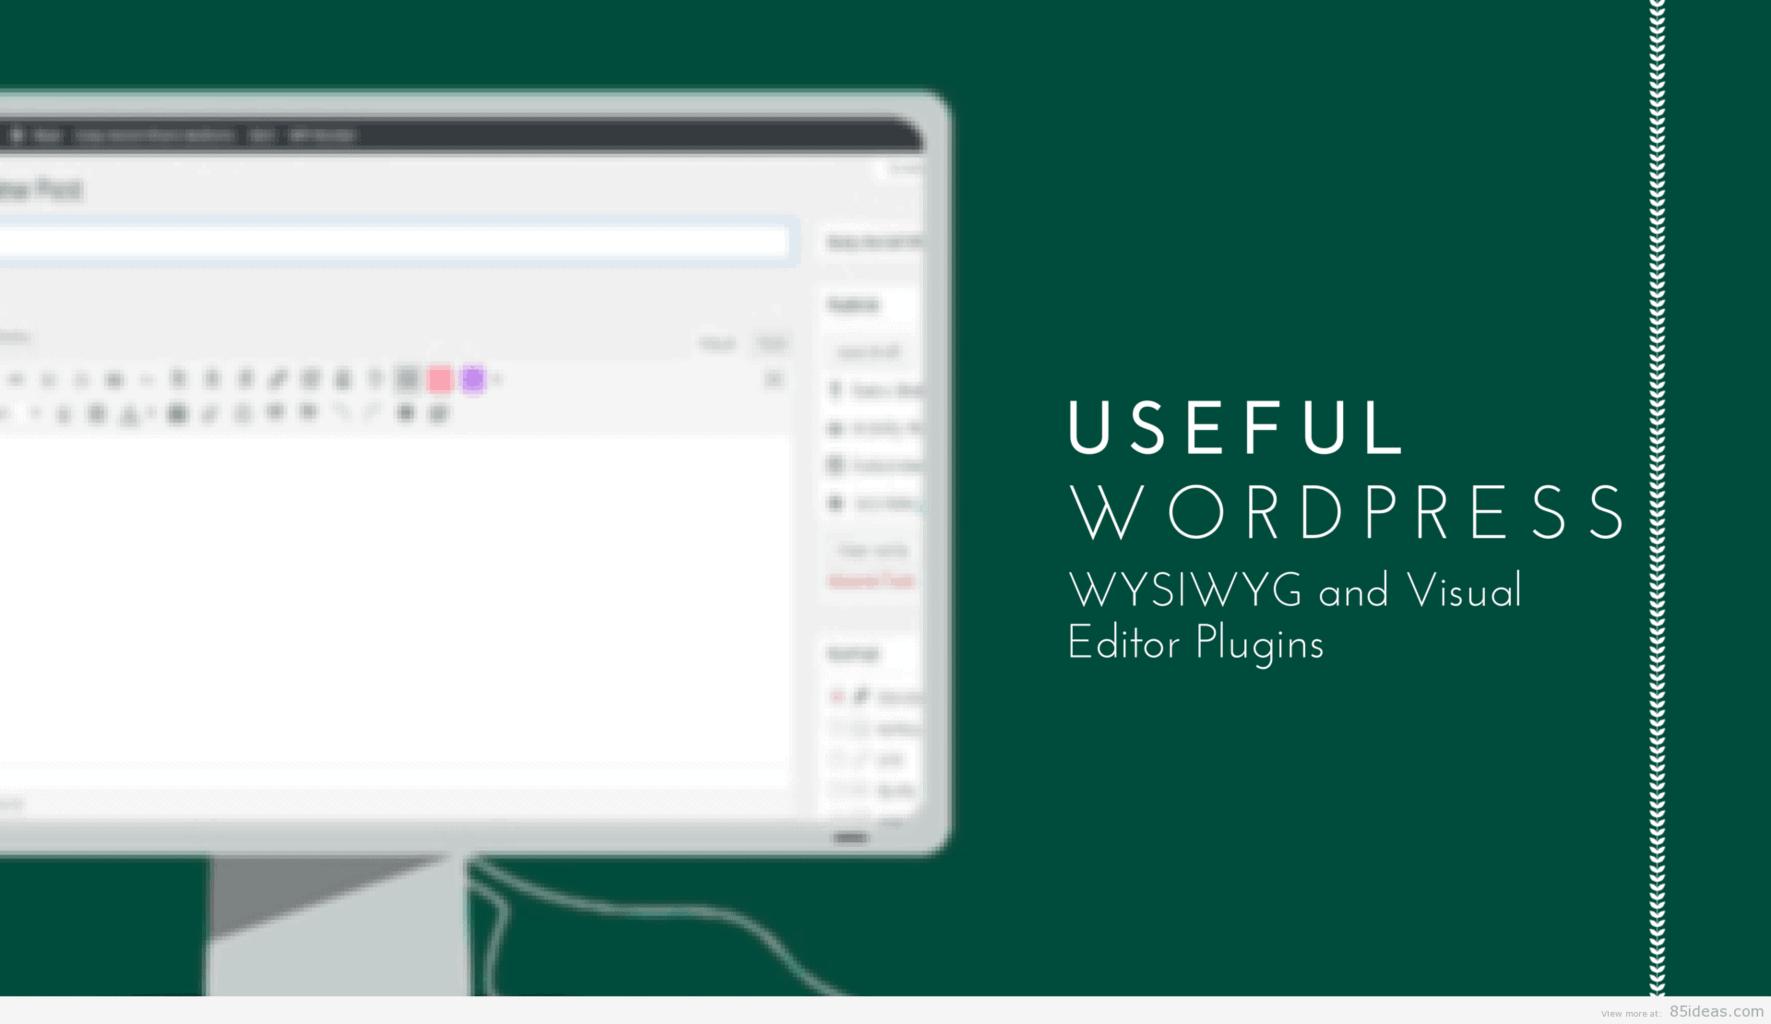 4 Useful WordPress WYSIWYG editor